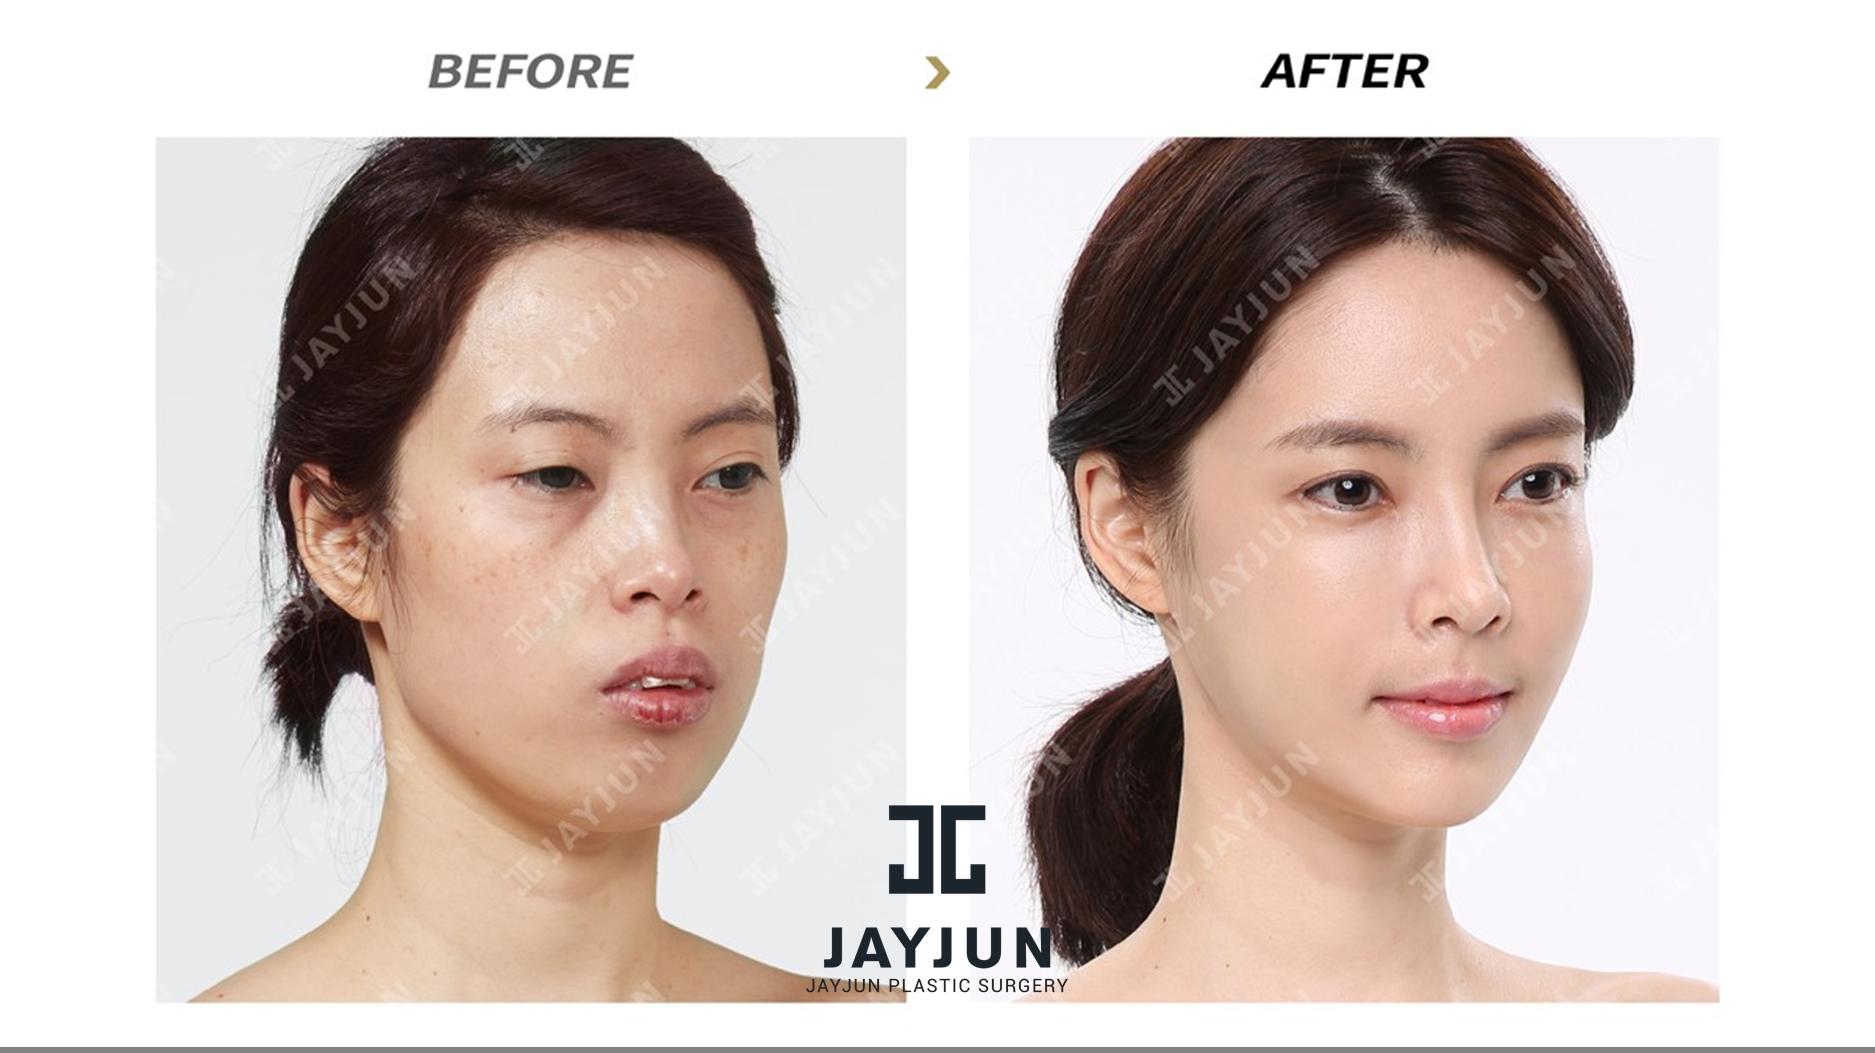 Korean Plastic Surgery Korea Cosmetic Surgery Korean Plastic Surgery Before And After Cosmetic Sur Plastic Surgery Korea Korean Plastic Surgery Plastic Surgery